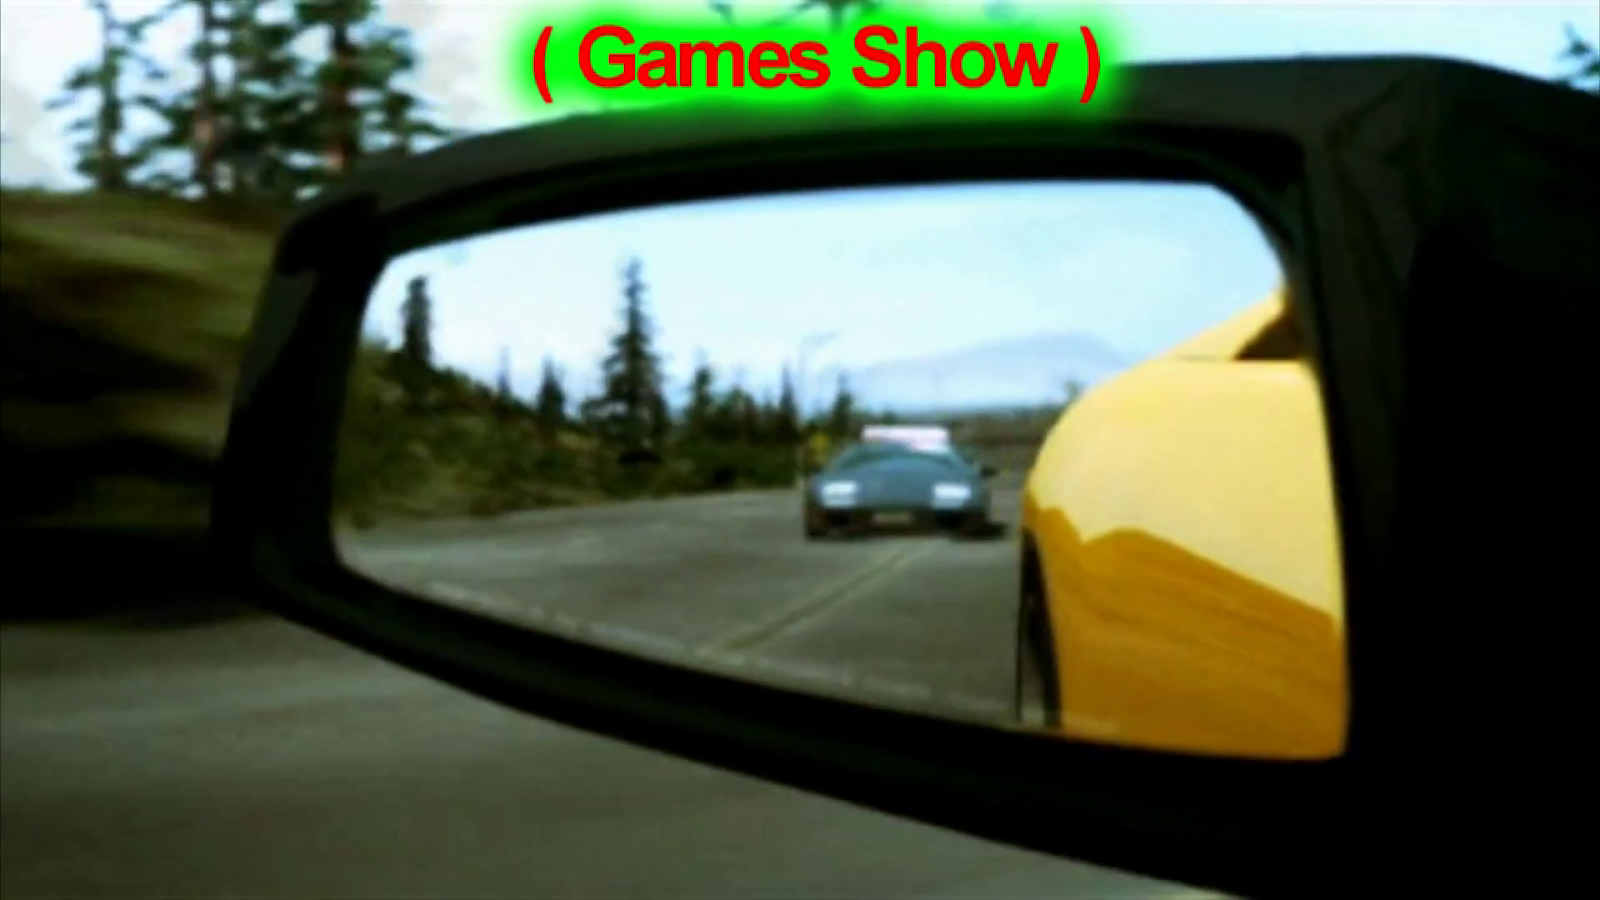 تحميل لعبة need for speed hot pursuit من ميديا فاير